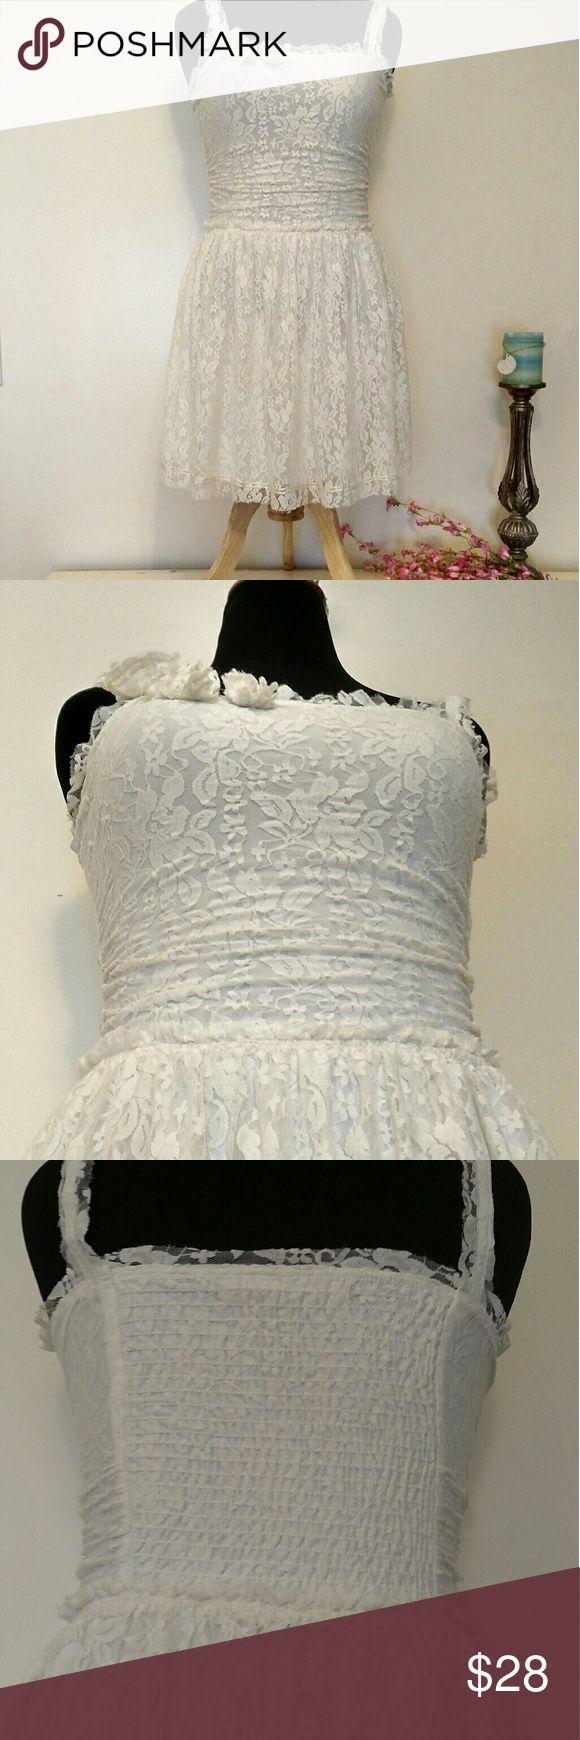 Pretty lace cream summer dress Soo pretty,, cream color lace , cute with flats or boots. Chelsea & Violet Dresses Midi